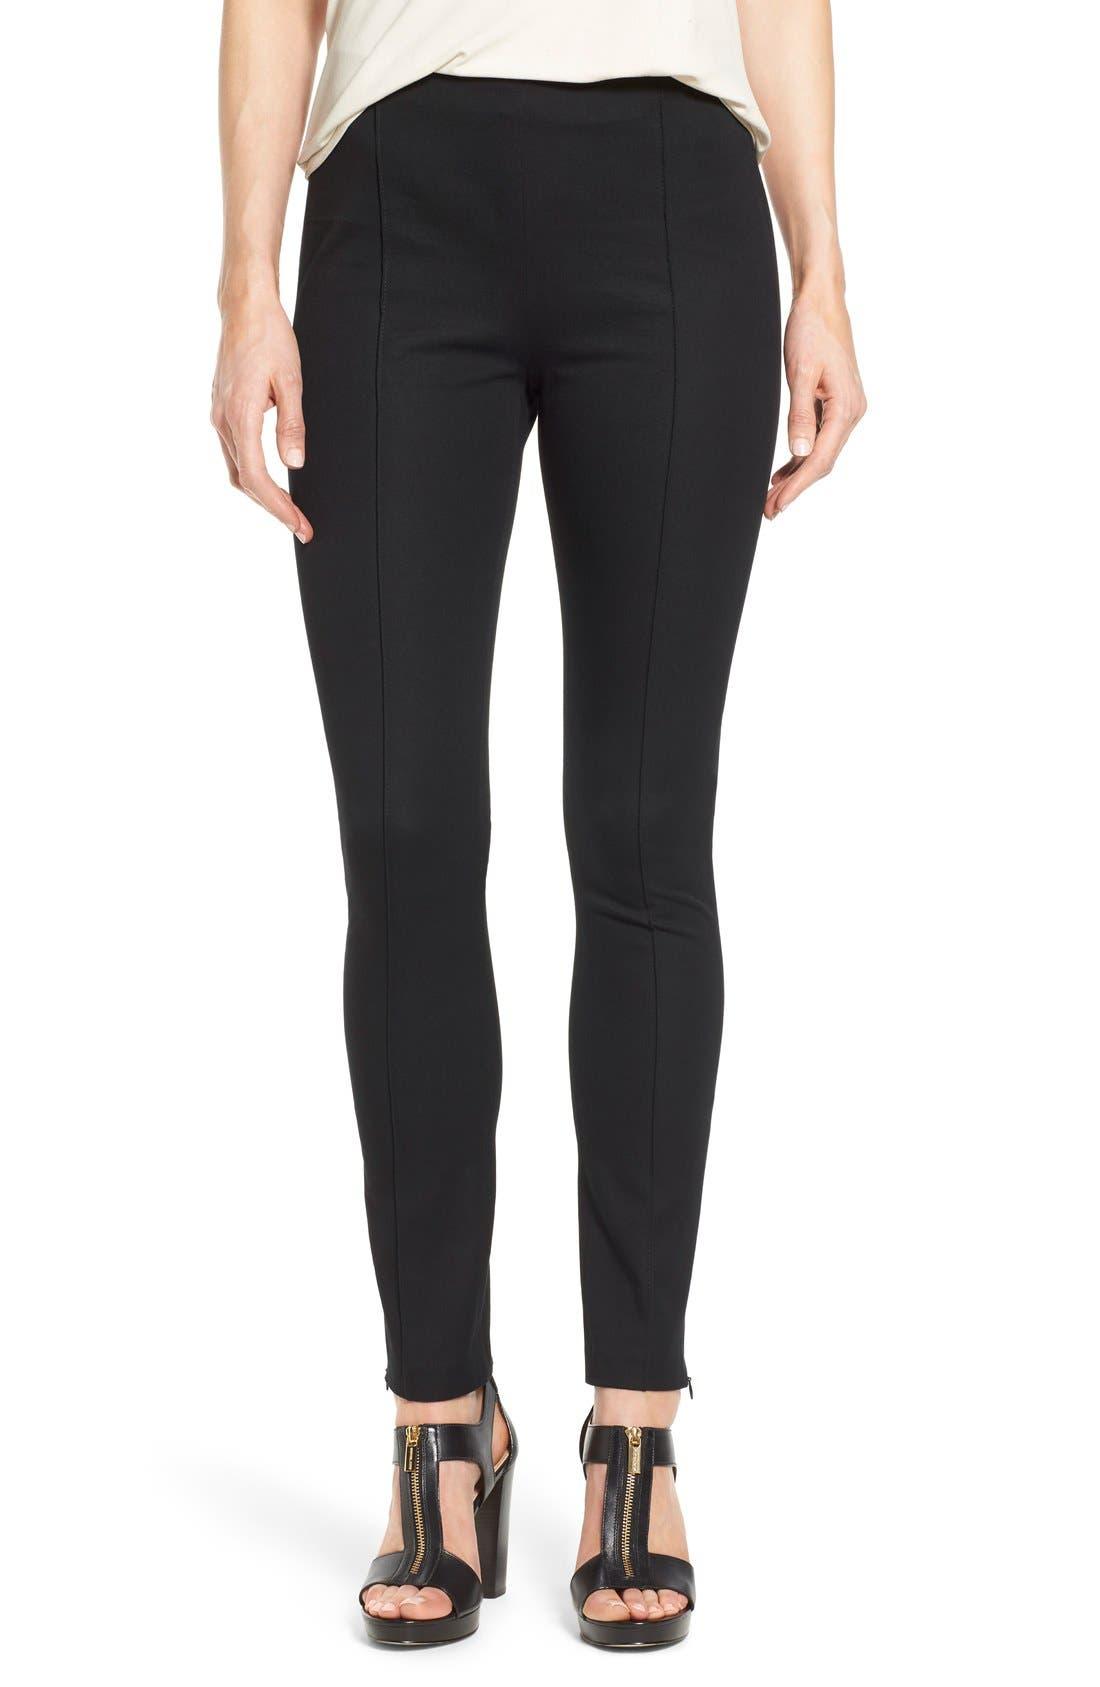 Main Image - MICHAEL Michael Kors 'Hutton' Ankle Zip Slim Pintuck Pants (Petite)